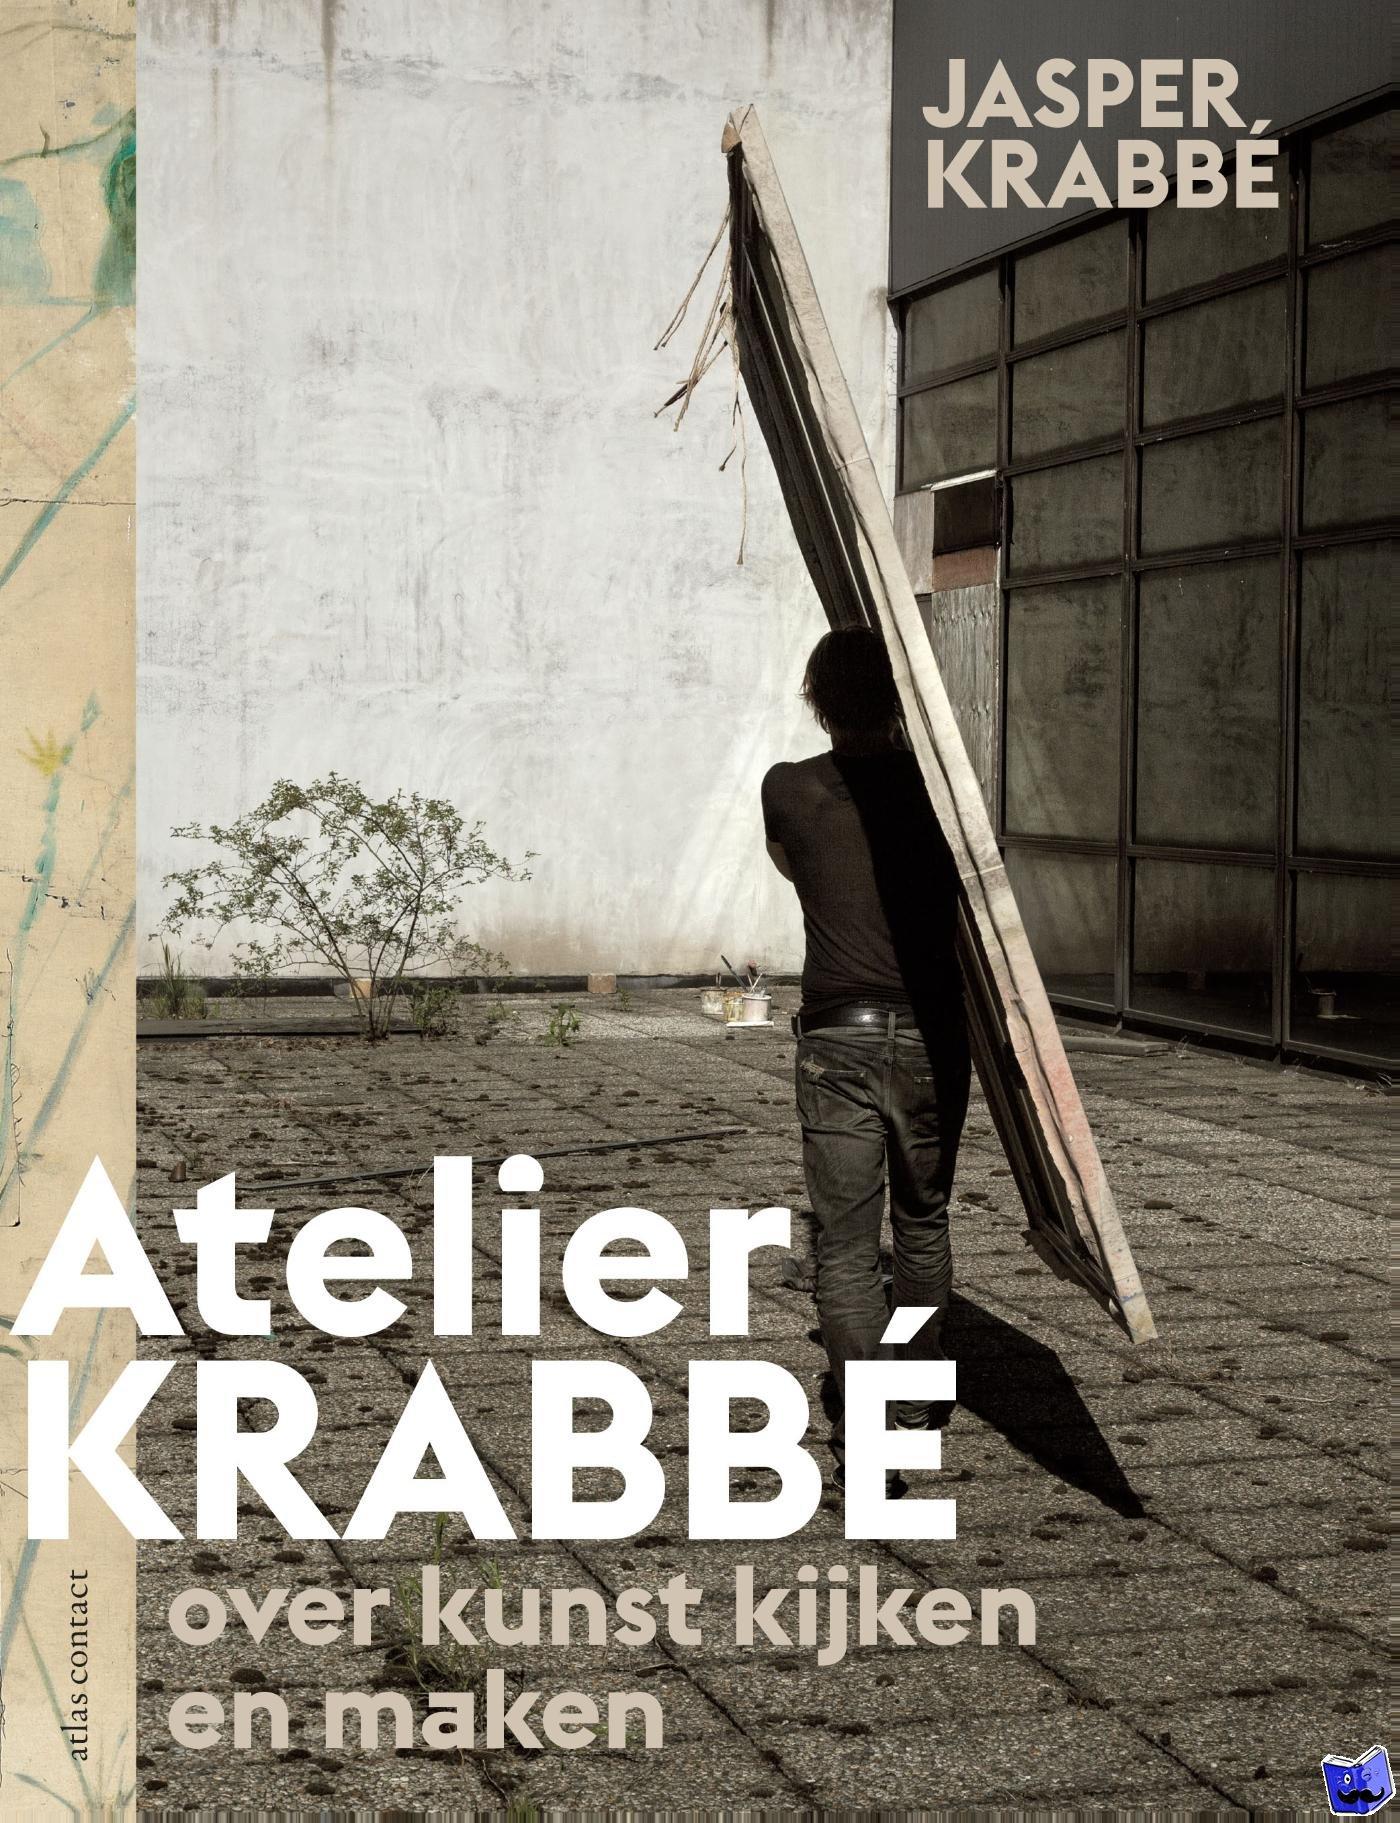 Krabbé, Jasper - Atelier Krabbé